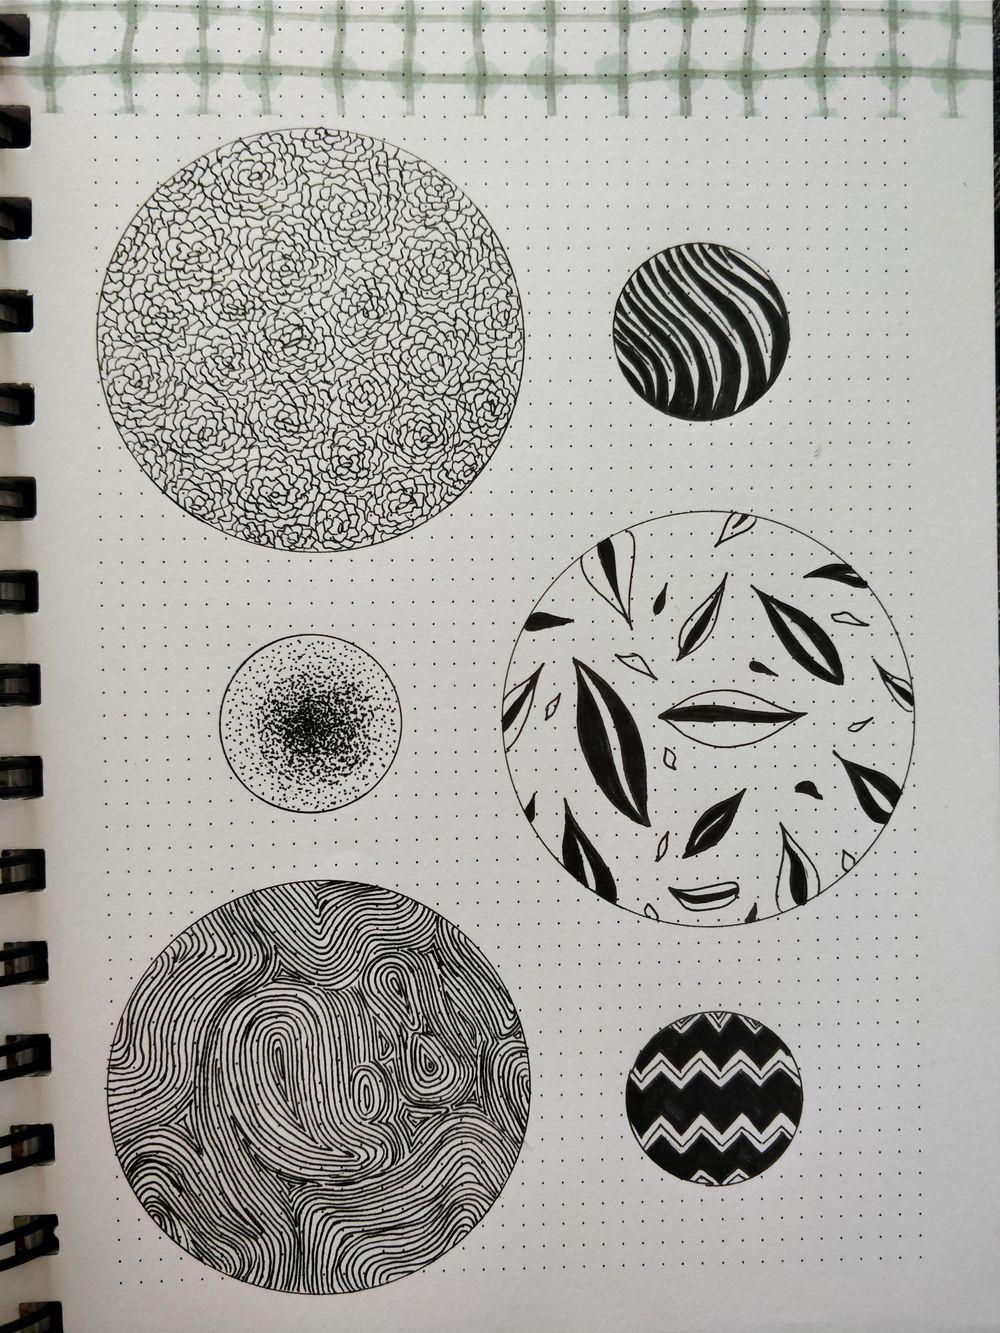 Pen Illustration - image 1 - student project